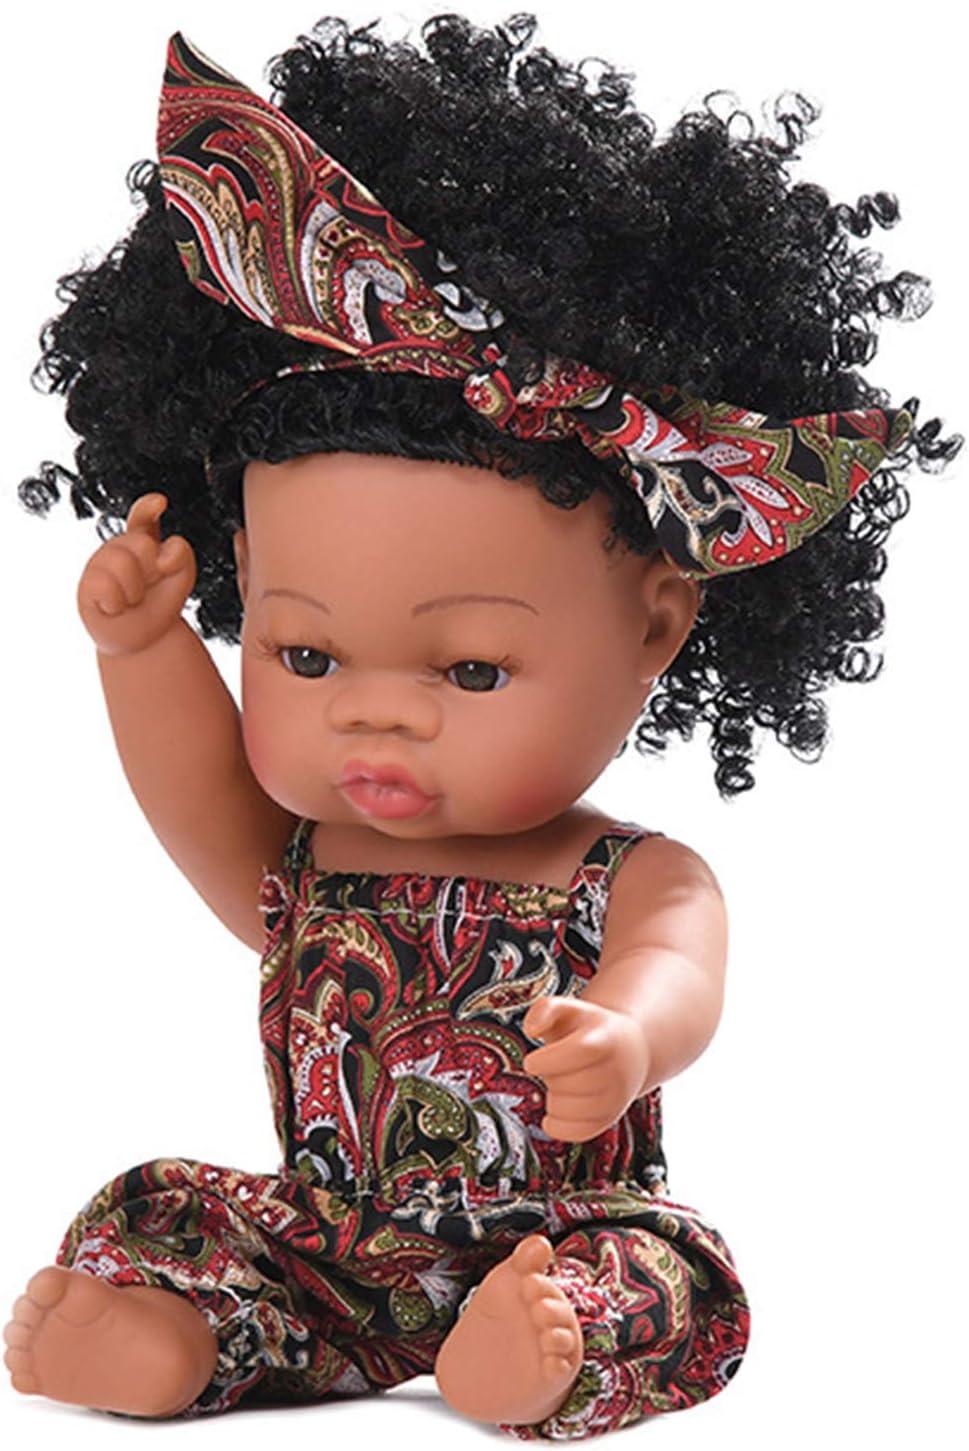 35cm Simulation Realistic Doll Soft Lifelik Babies Vinyl Tucson Mall Max 54% OFF Toddler